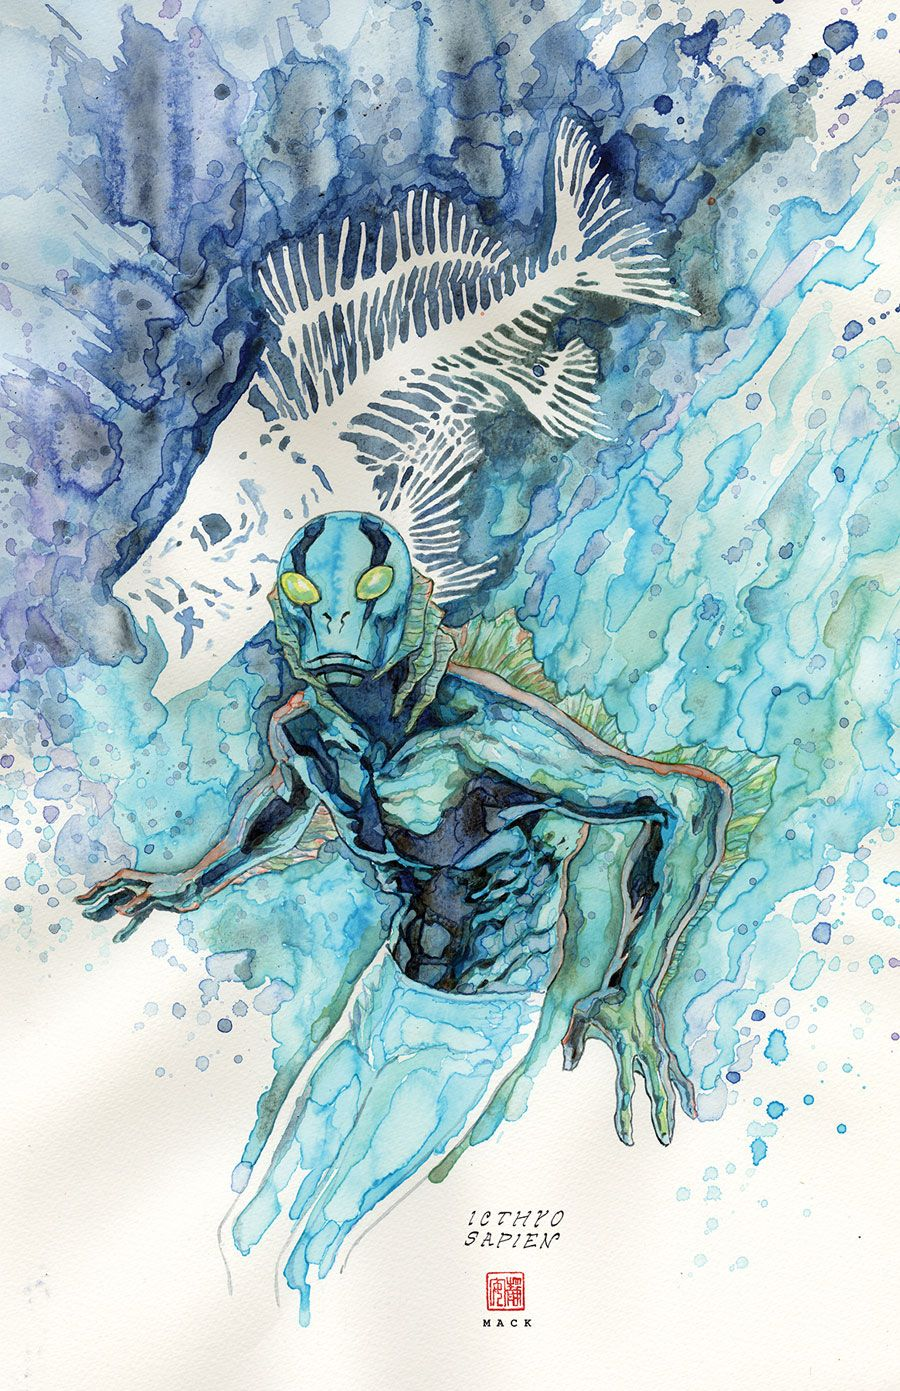 Abe Sapien #31 - Variant cover by David Mack